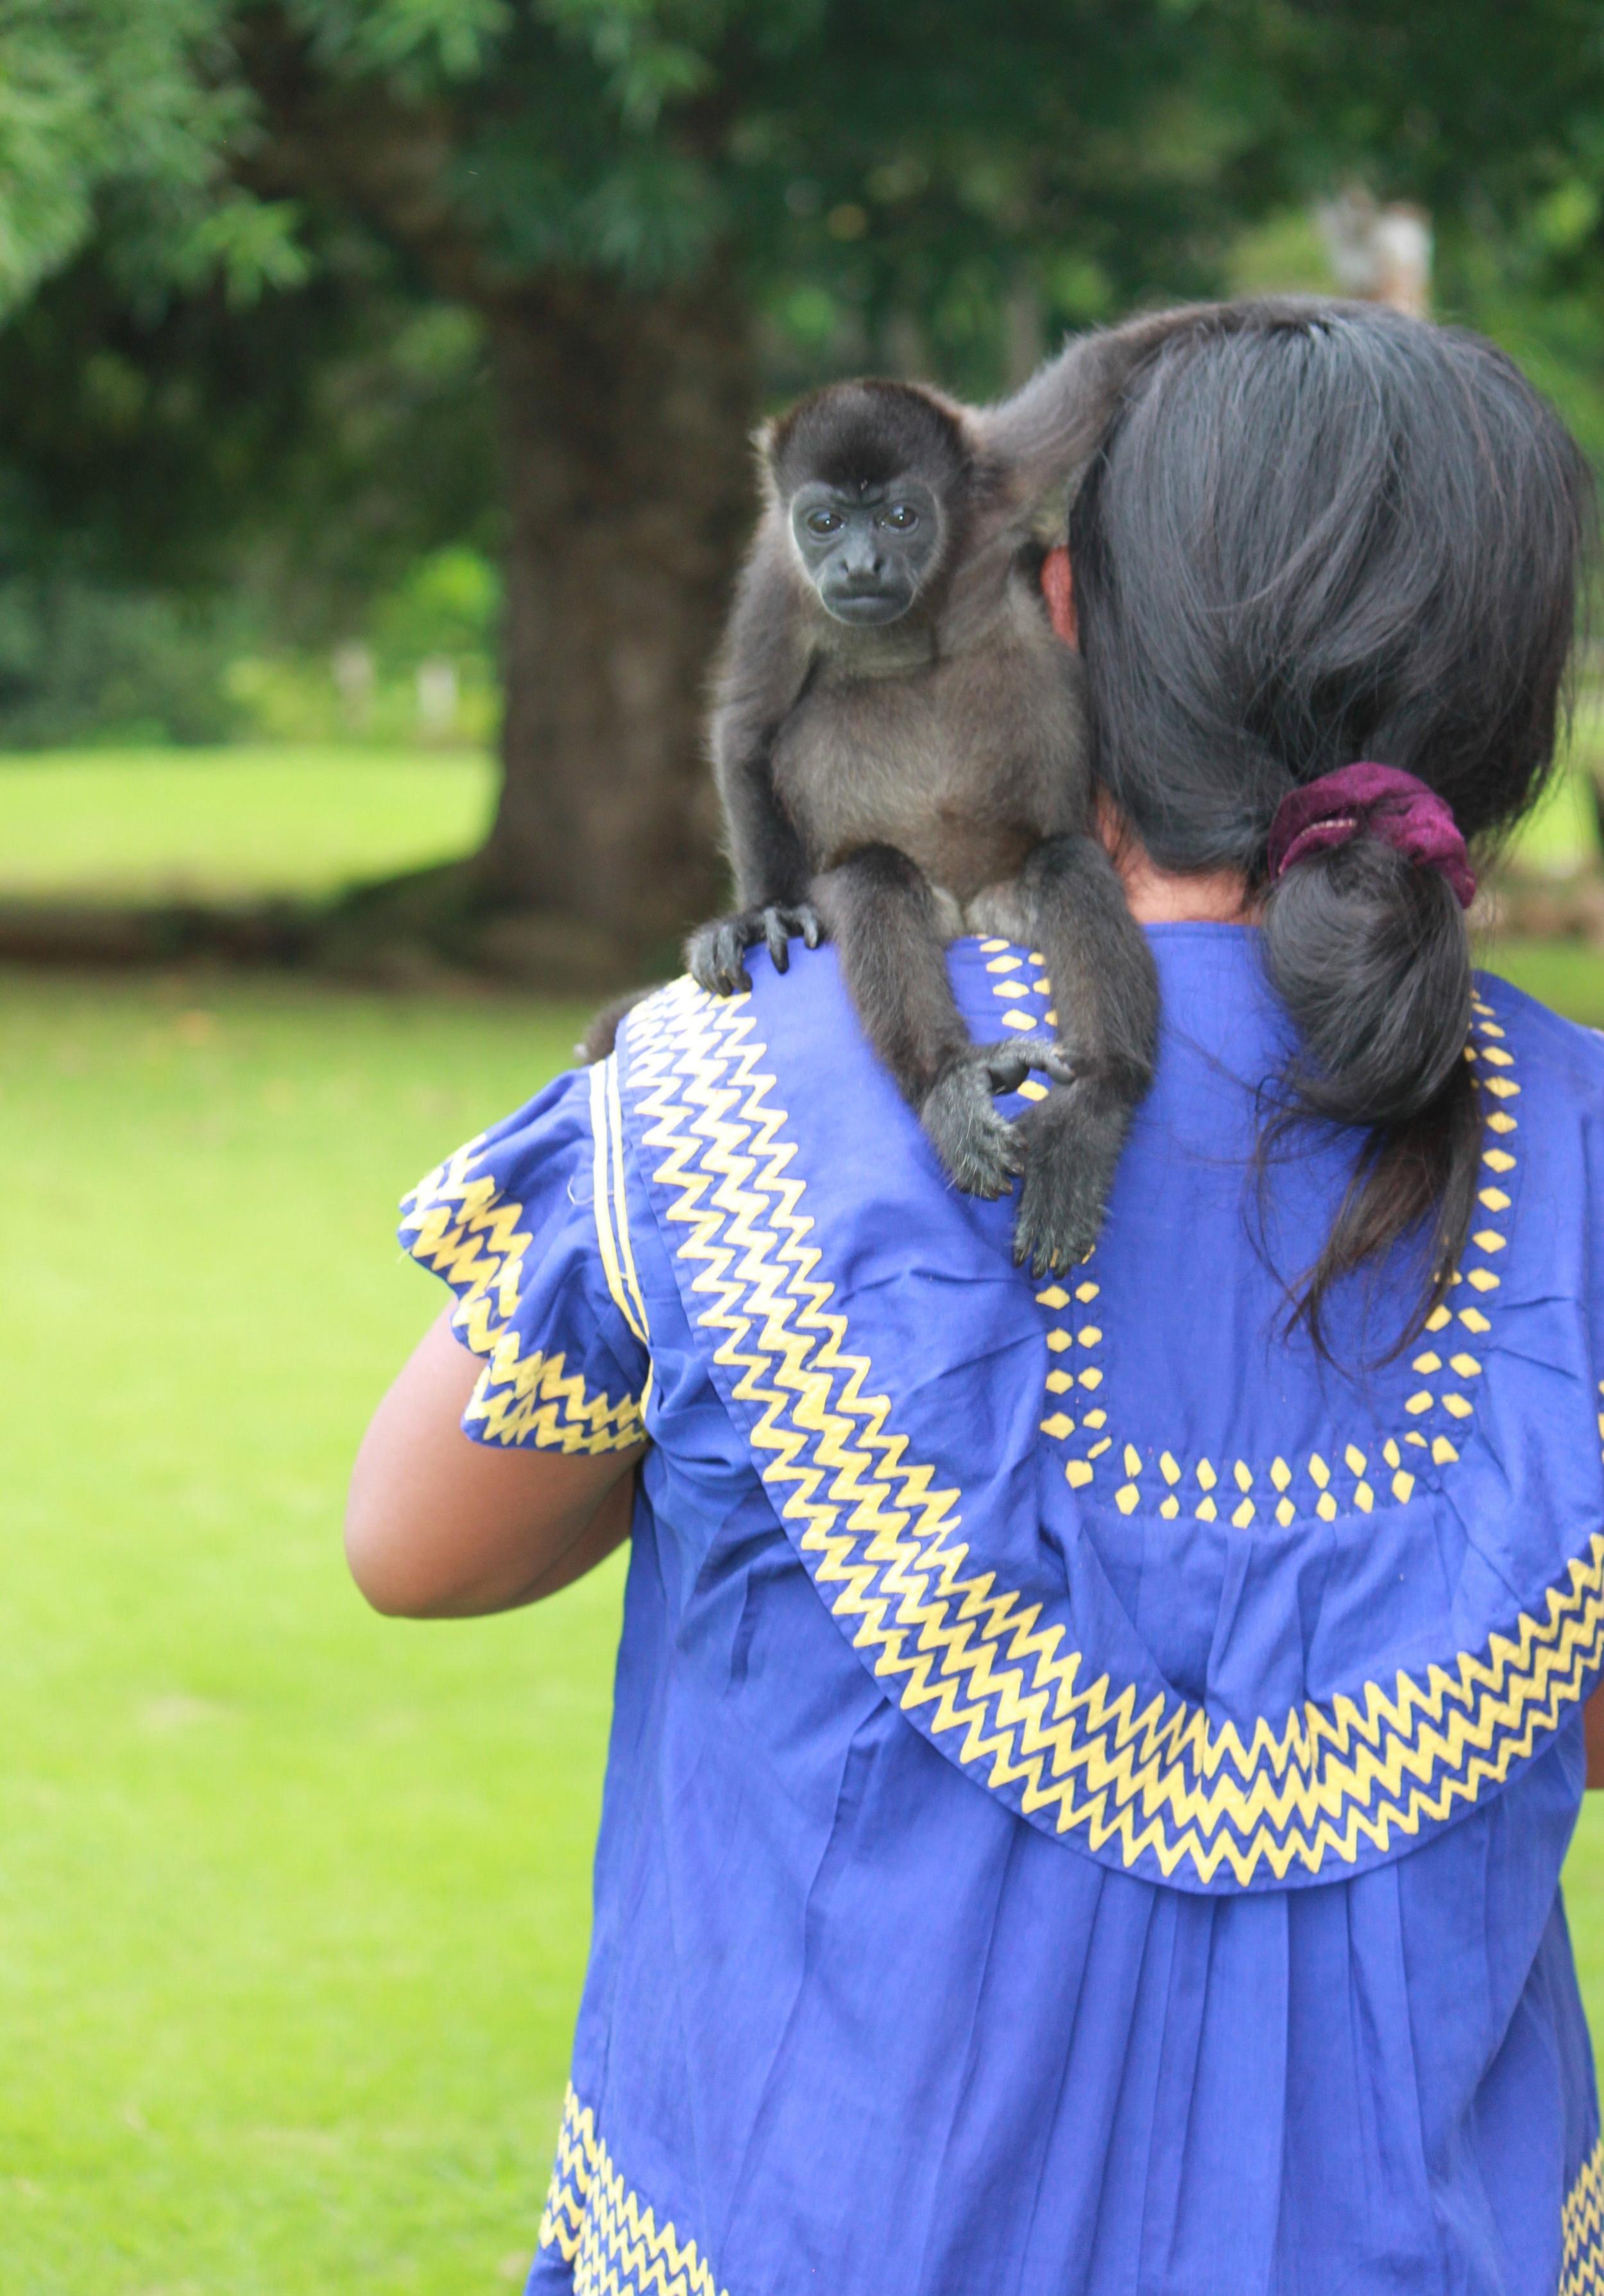 Infant Mantled Howler Monkey: Atlas